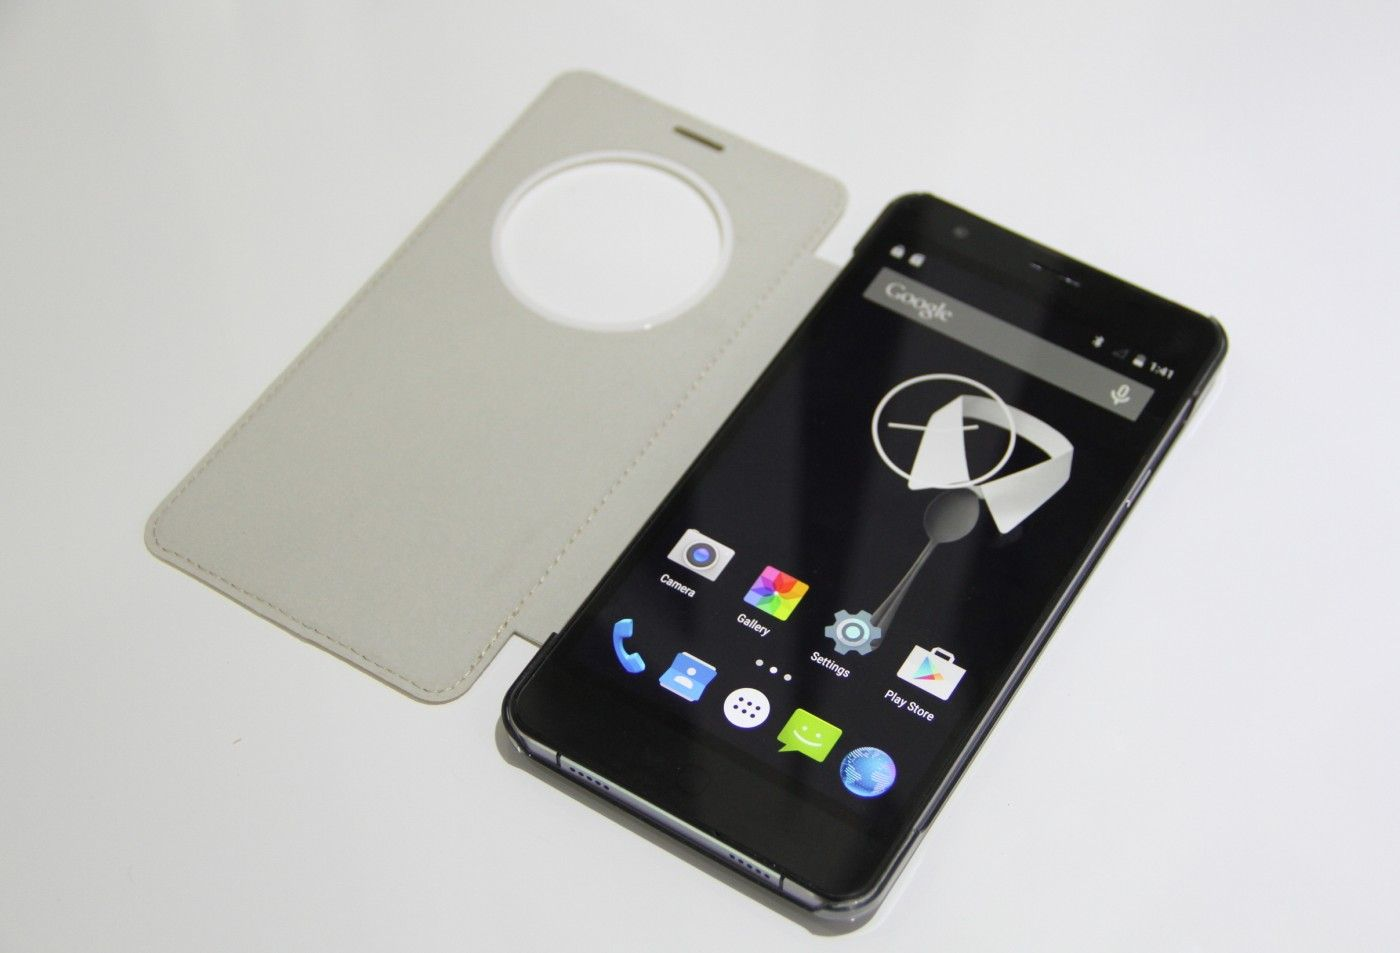 9 efox, Elephone, flash sales, mercado mobile, smartphone